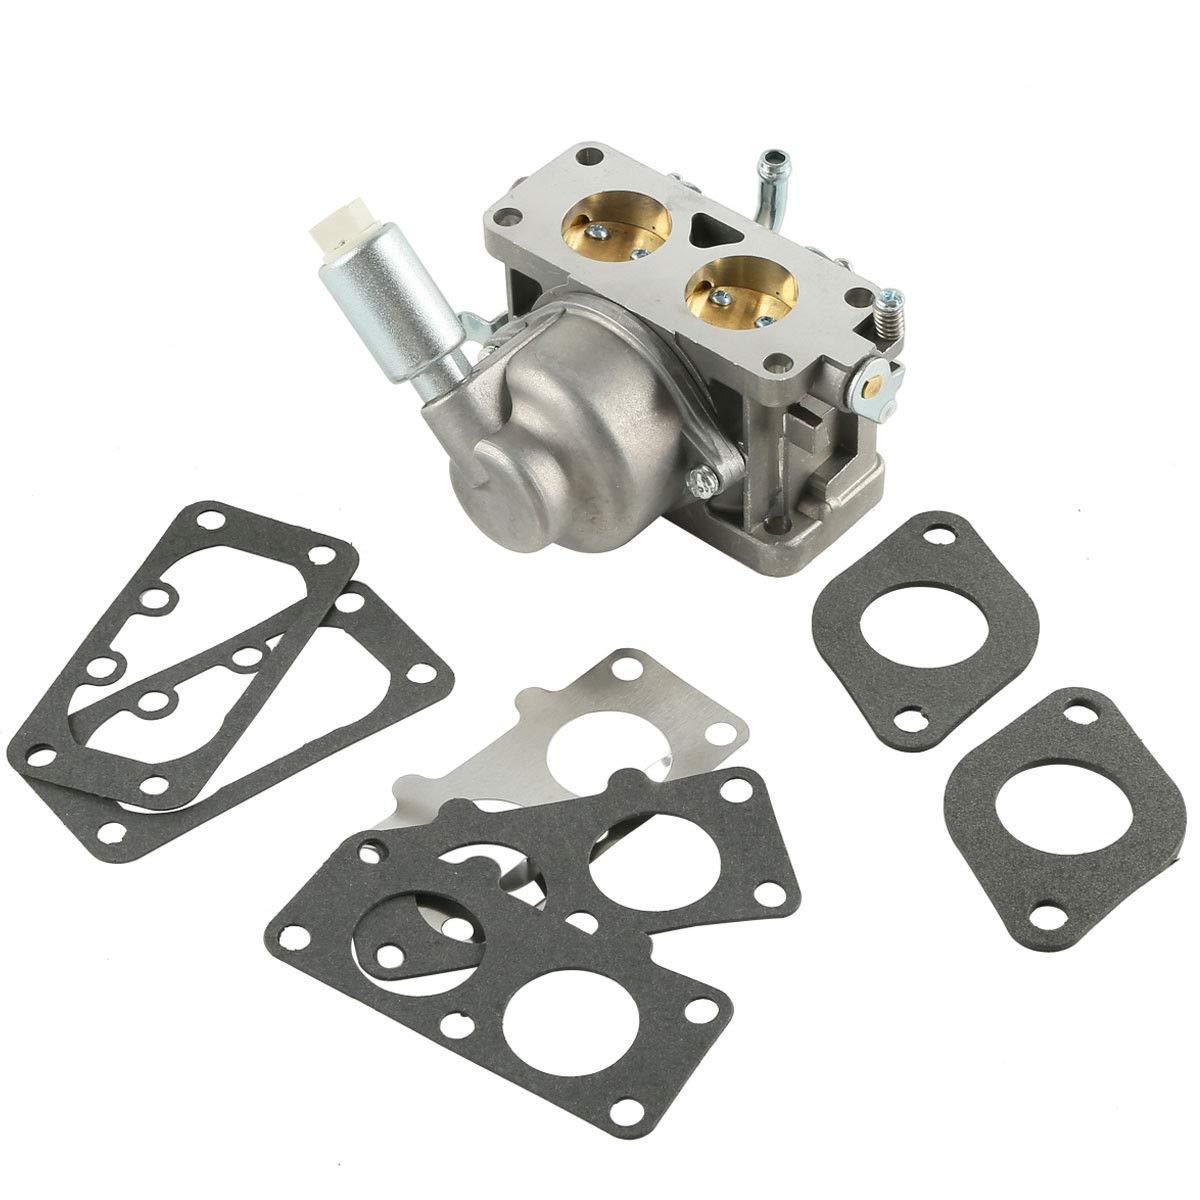 FidgetKute for Briggs & Stratton 791230 Manual Choke Carburetor Replaces 699709 499804